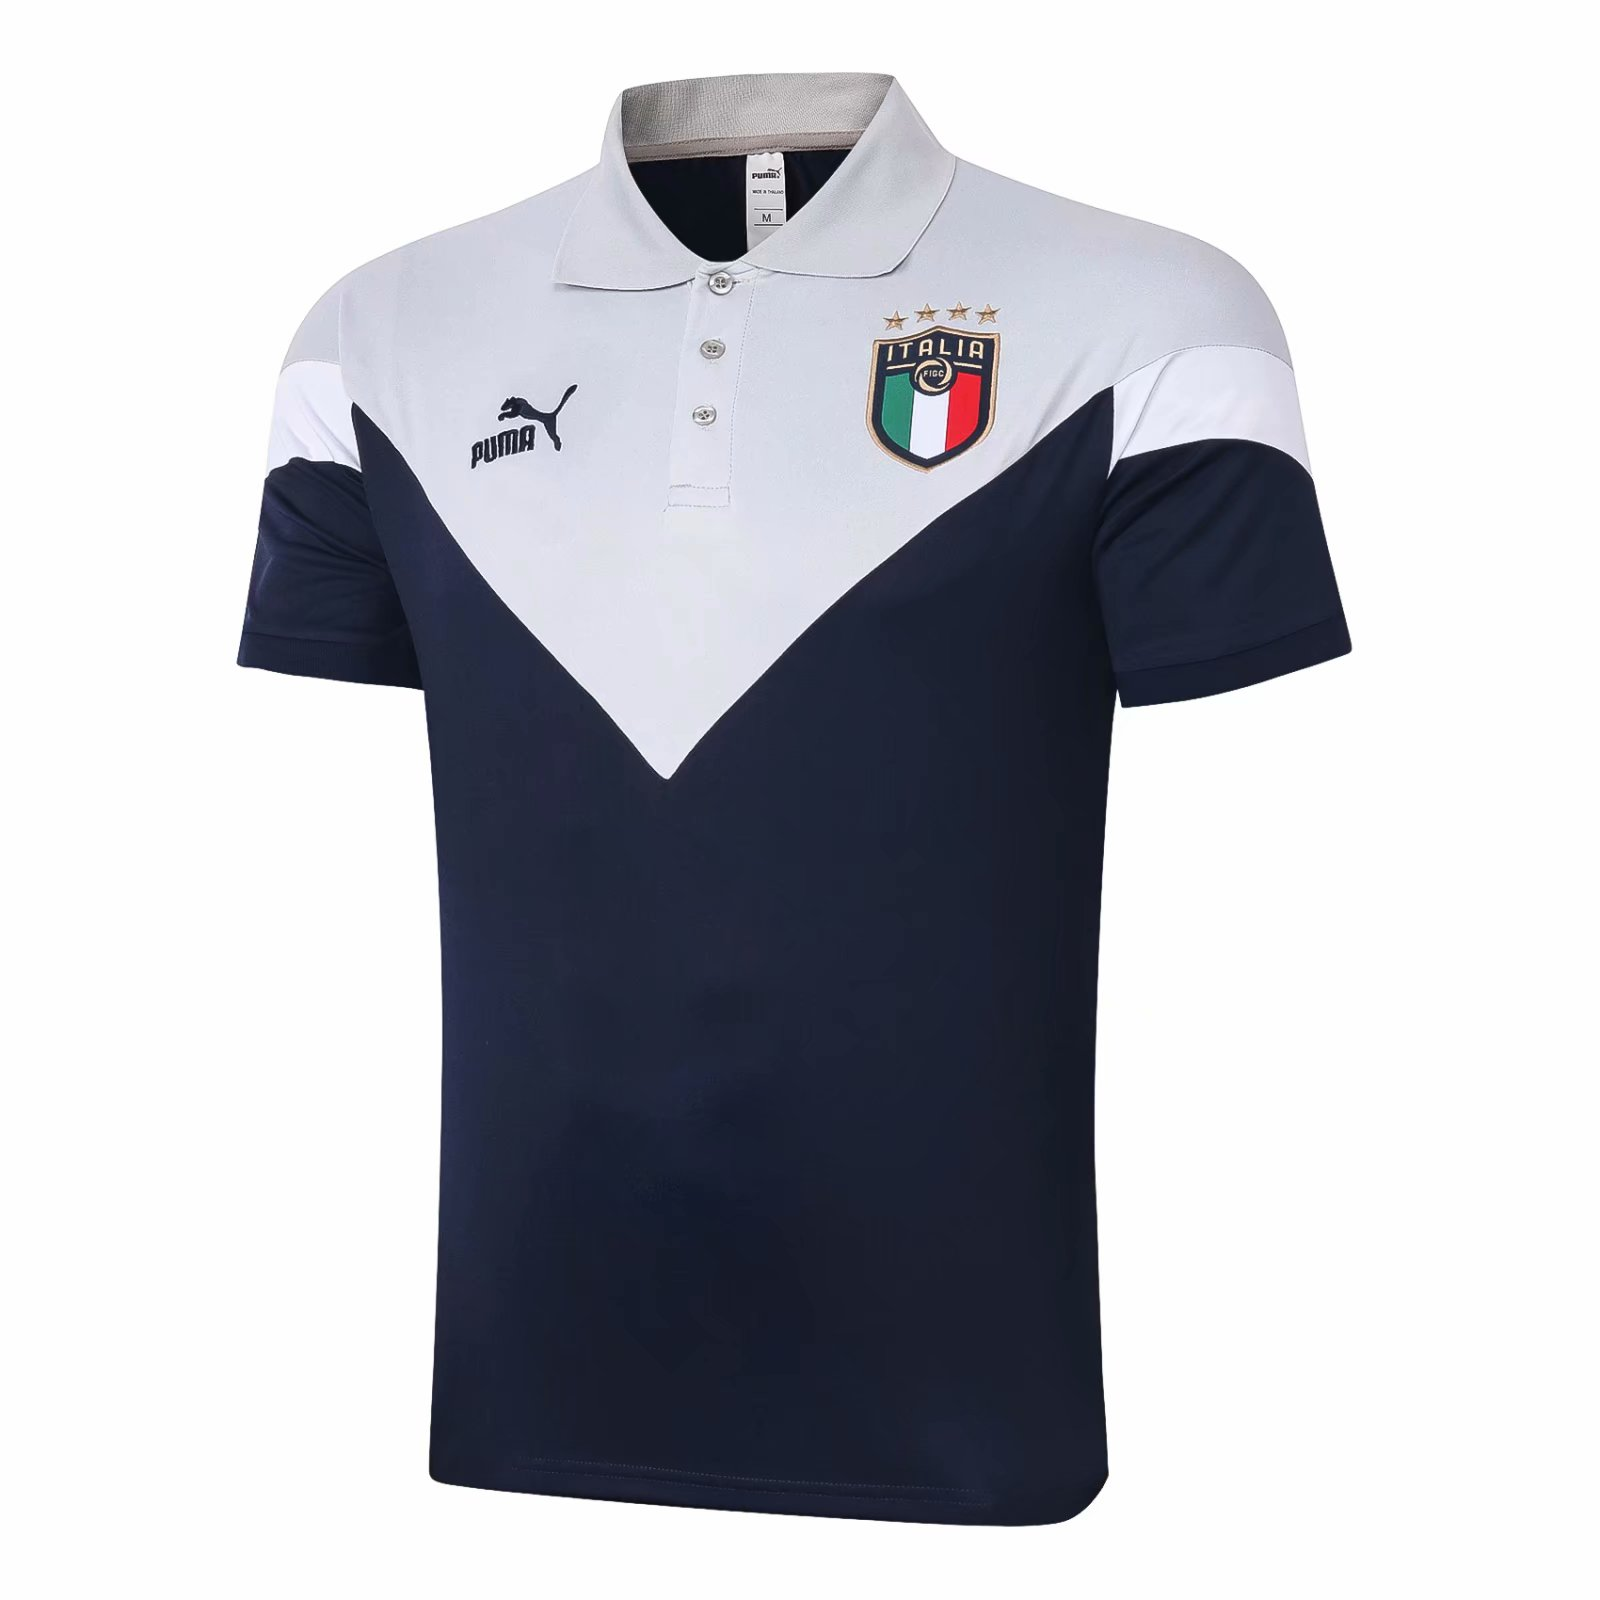 ITÁLIA CAMISA POLO 2021